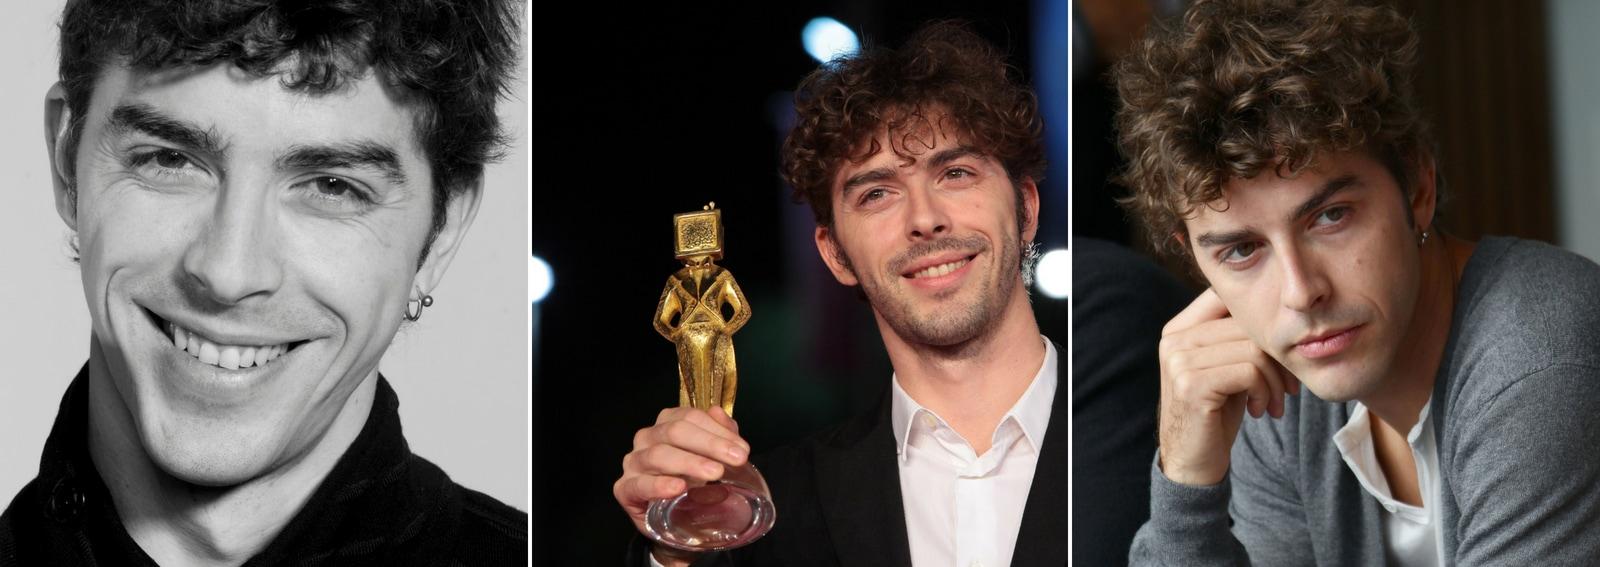 Michele Riondino attore tarantino padrino Festival Cinema Venezia 2018 Il giovane Montalbano DESK